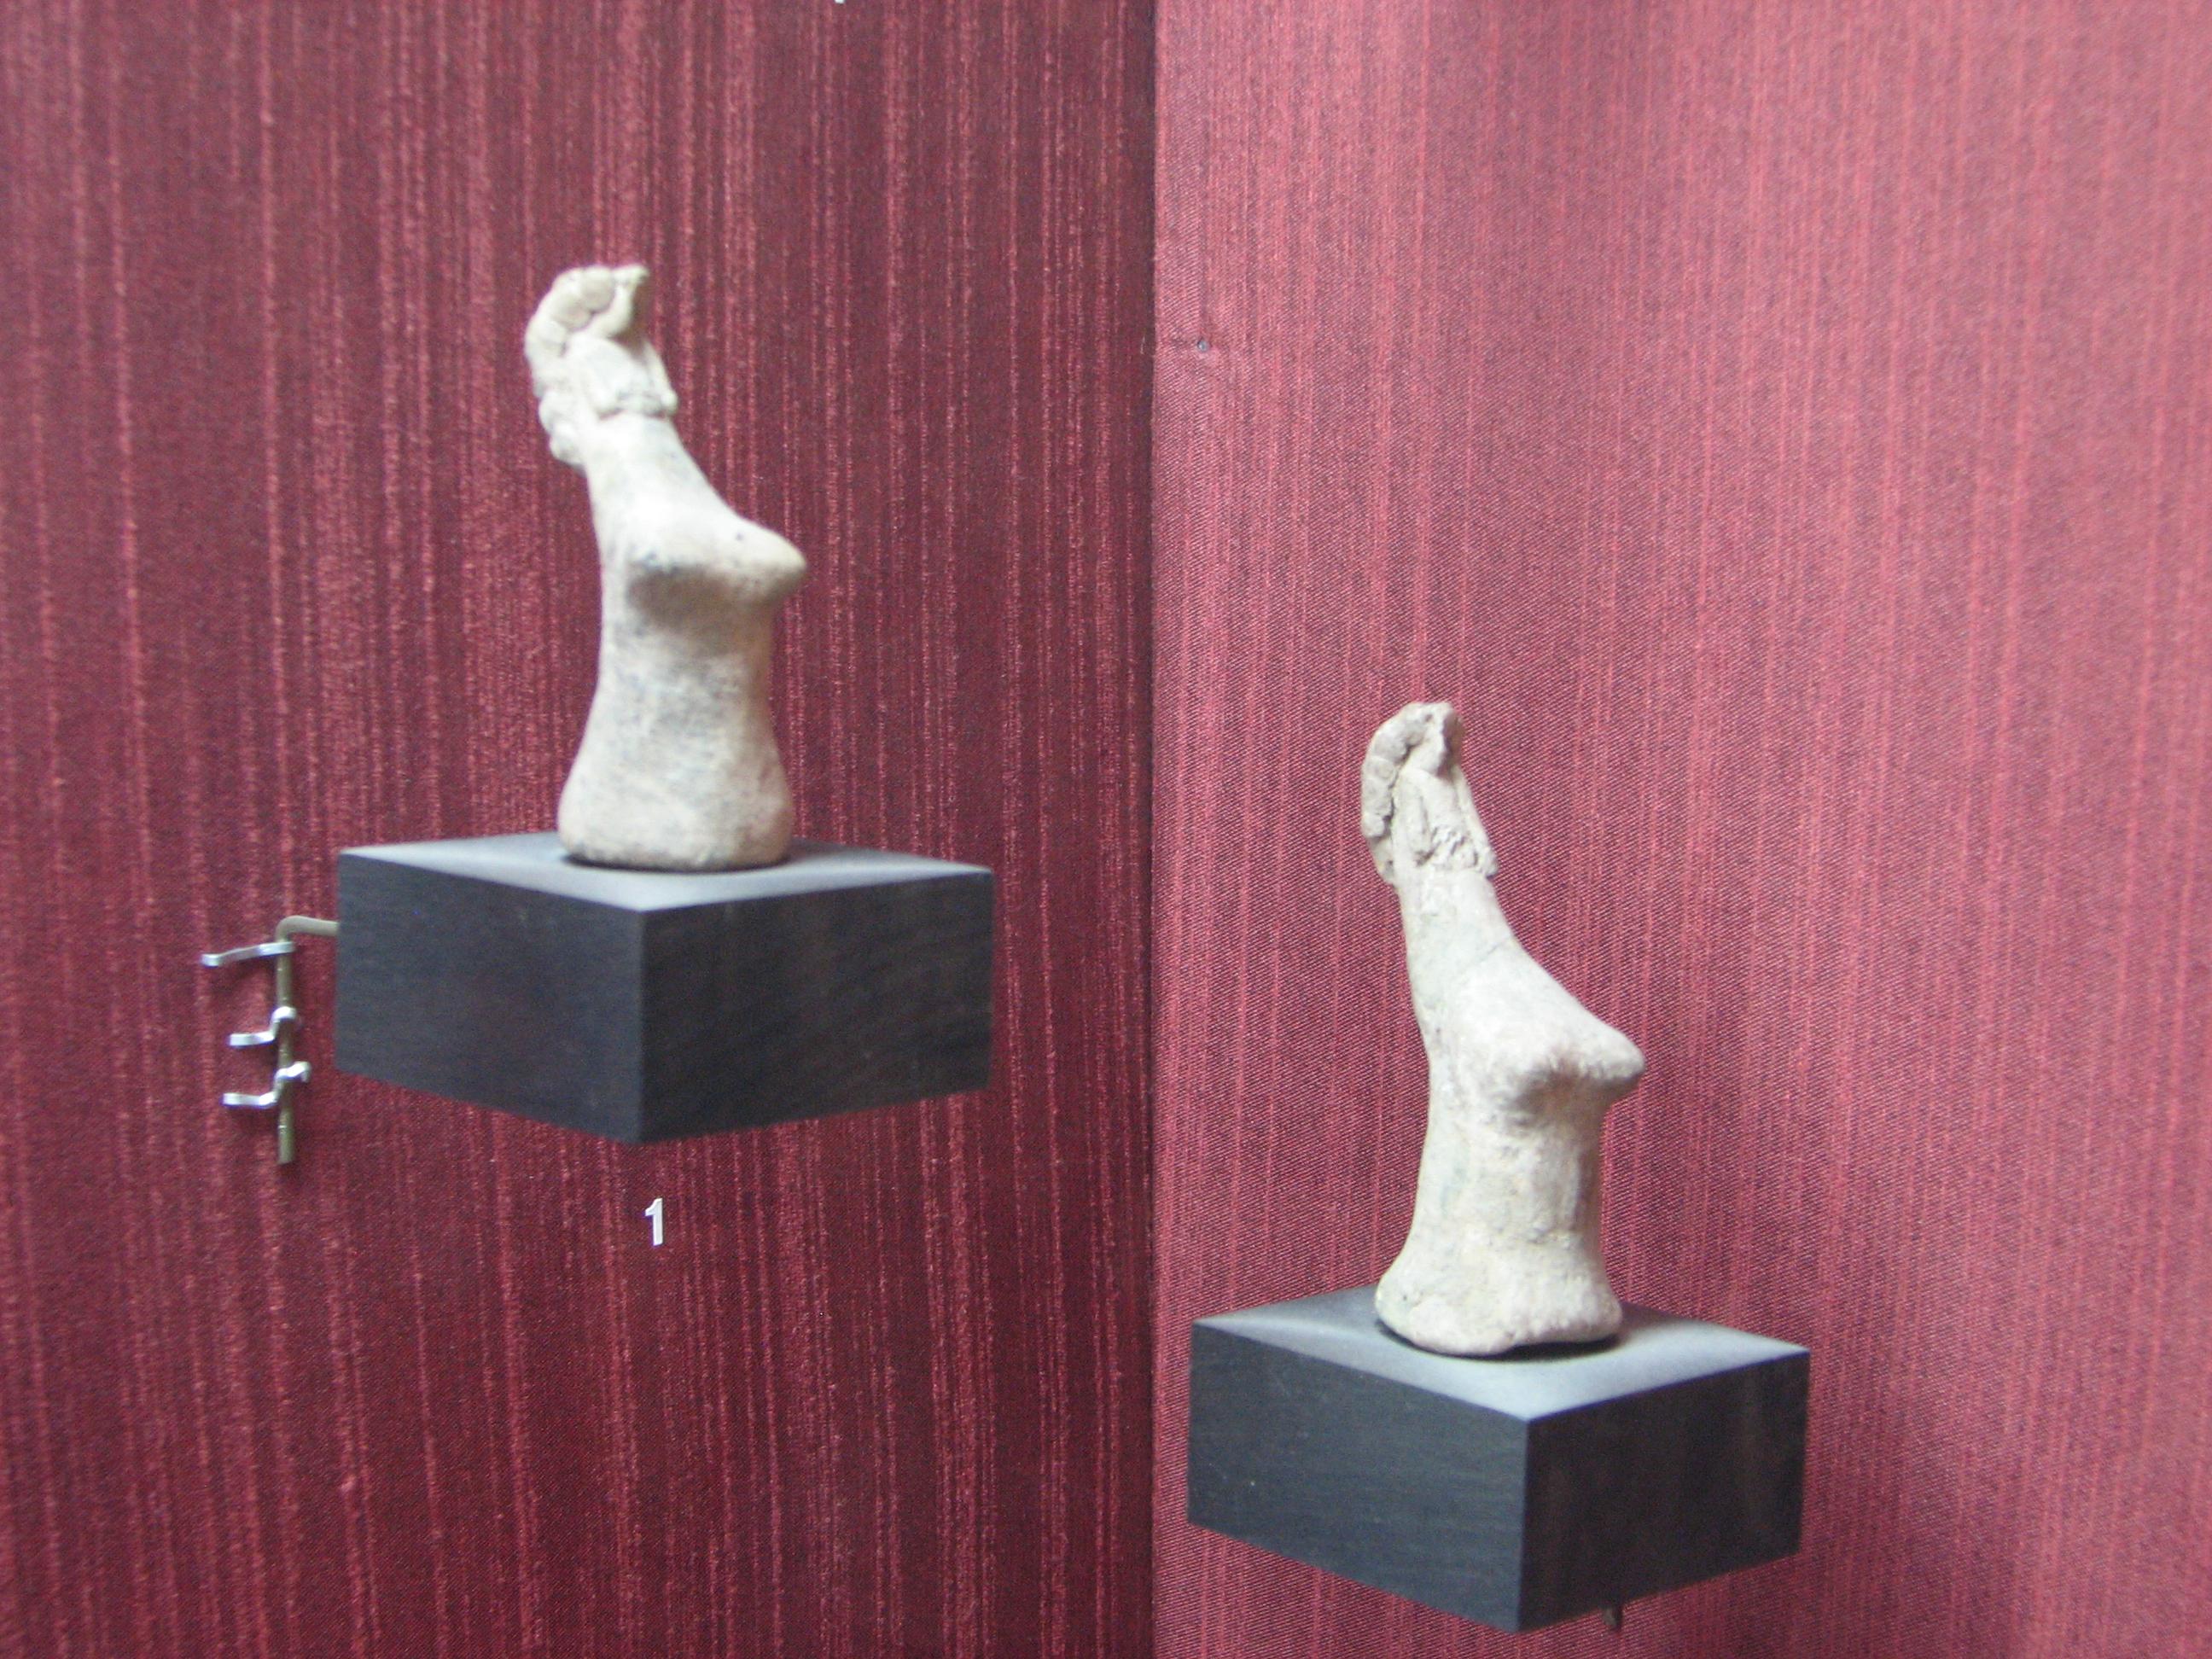 File:Dagon Museum, Fertility Figurine (1) JPG - Wikimedia Commons